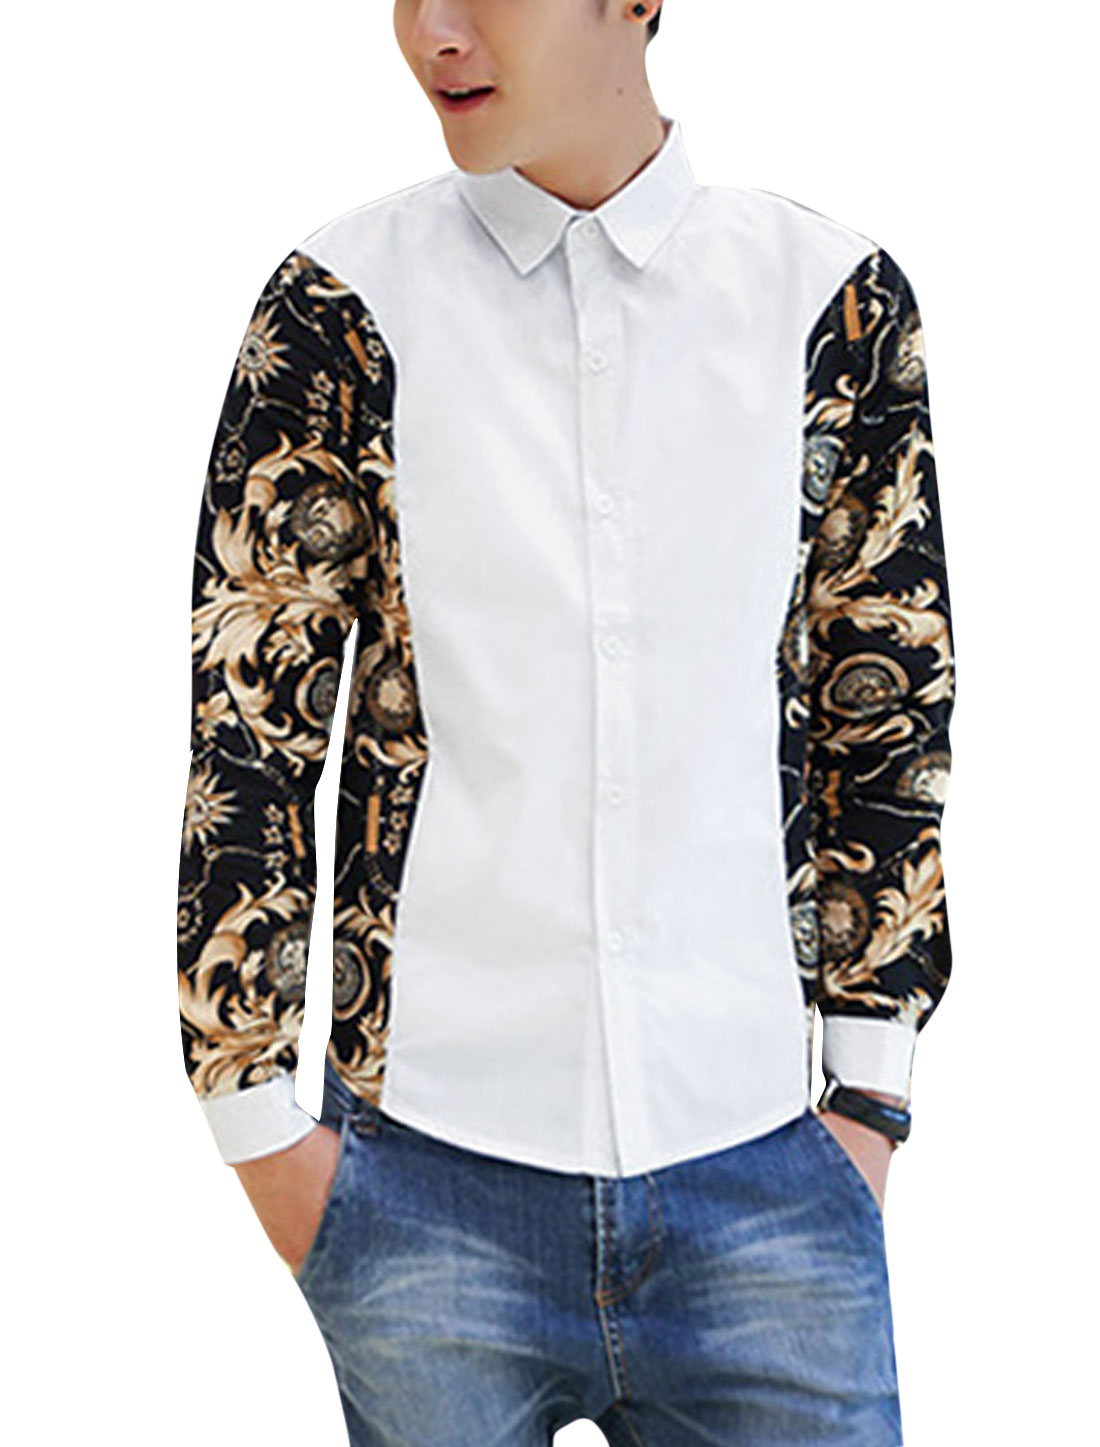 Men Contrast Floral Pocket Watch Print Buttoned Cuffs Stylish Shirt White M